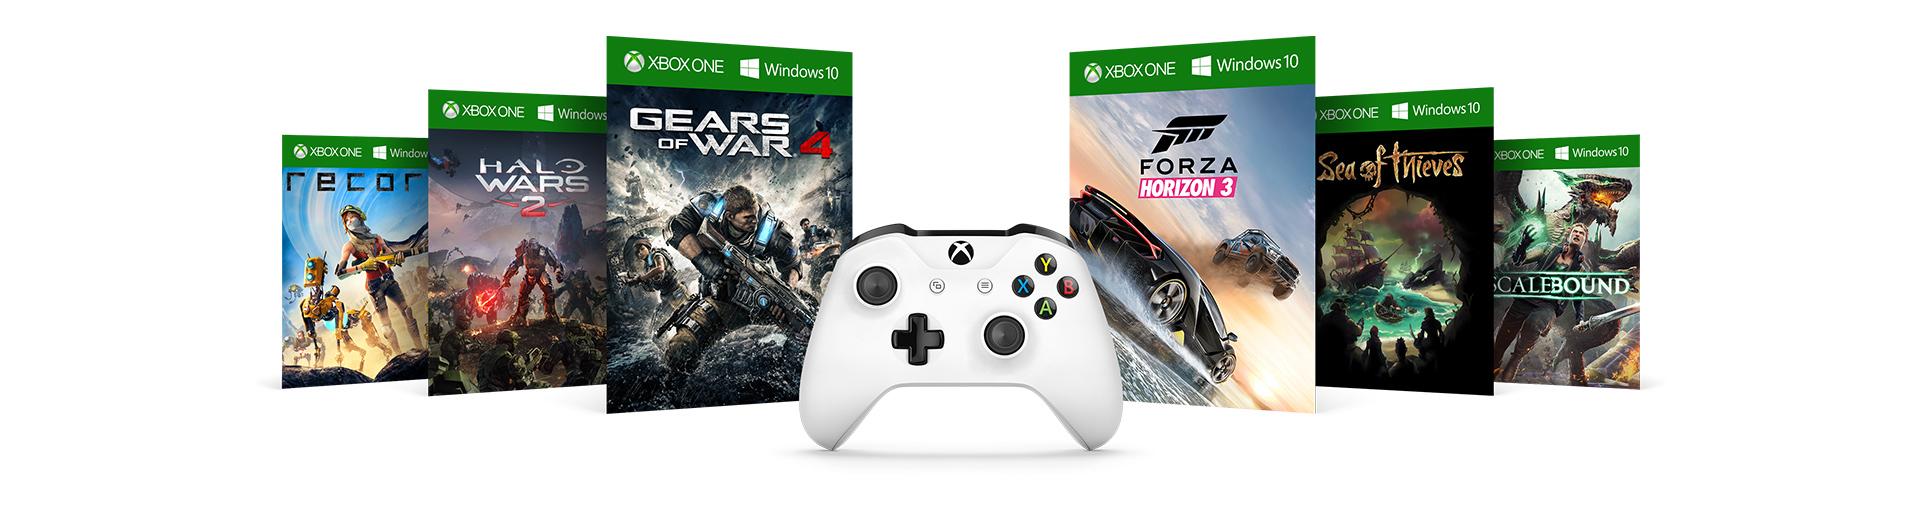 Xbox PlayAnyWhere